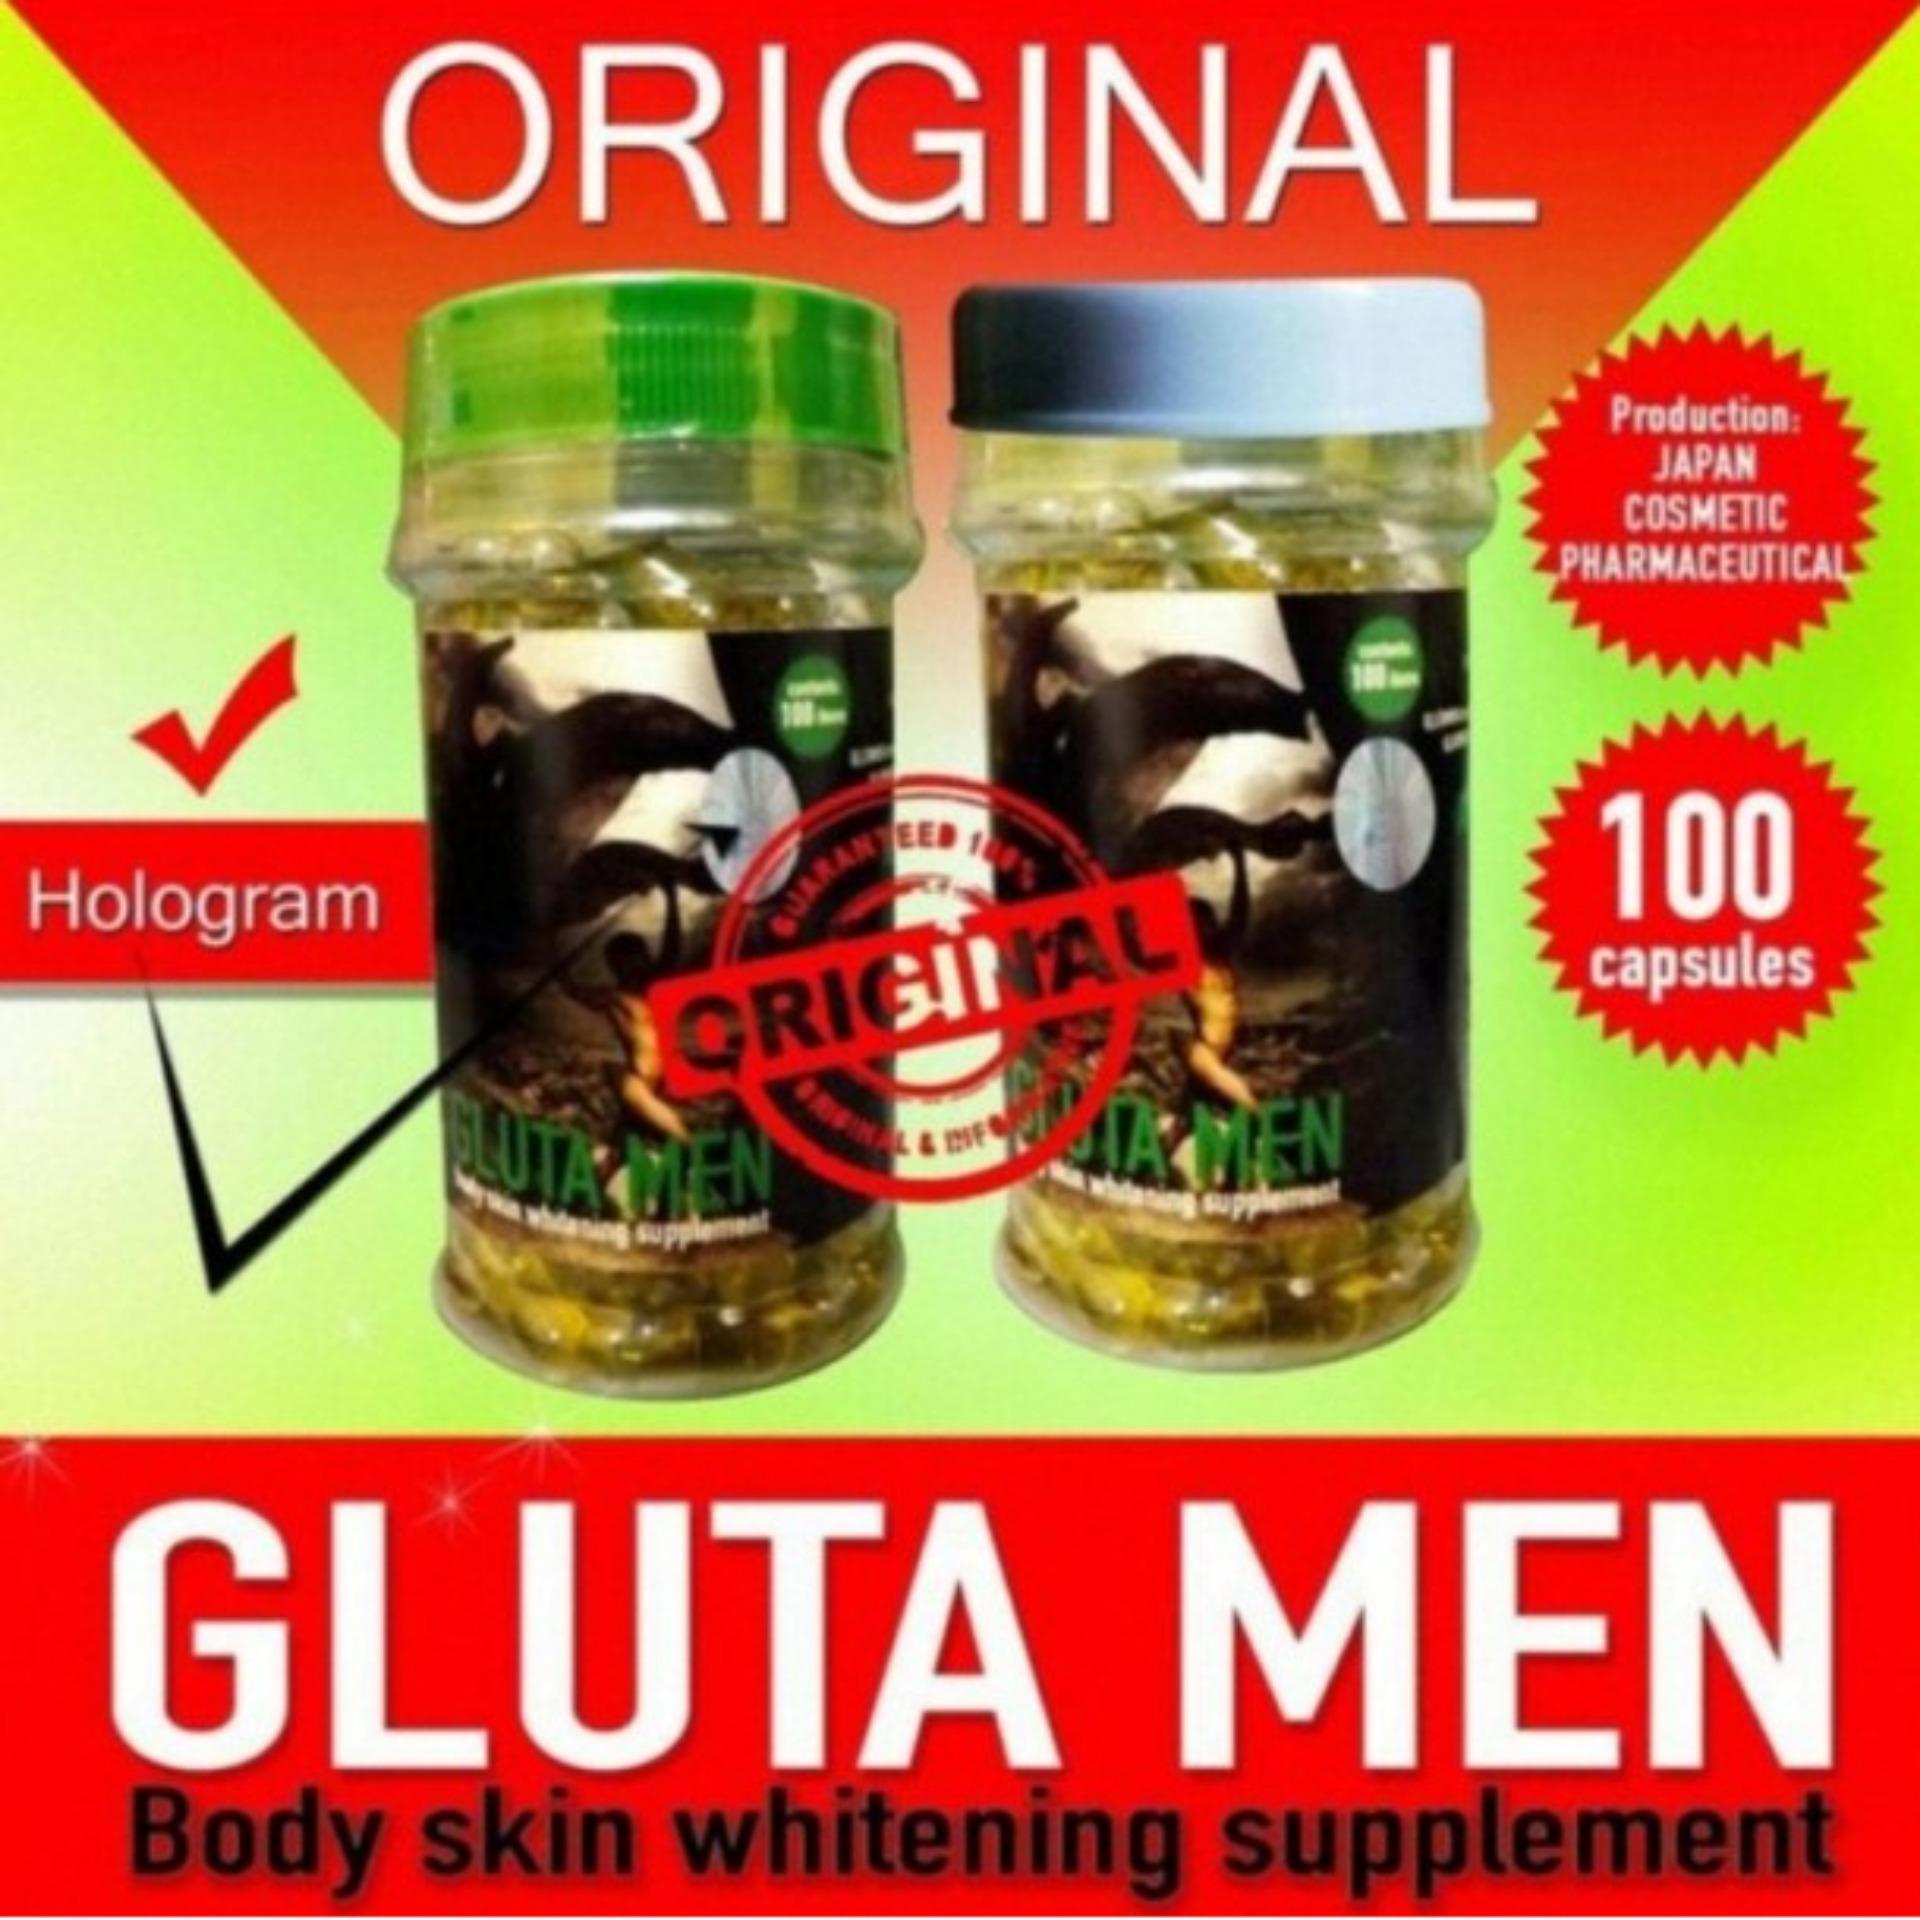 Glutamen Anti Aging Khusus Pria 100 Kapsul Gluta Men Asthin Force Stemcell Di Jawa Barat